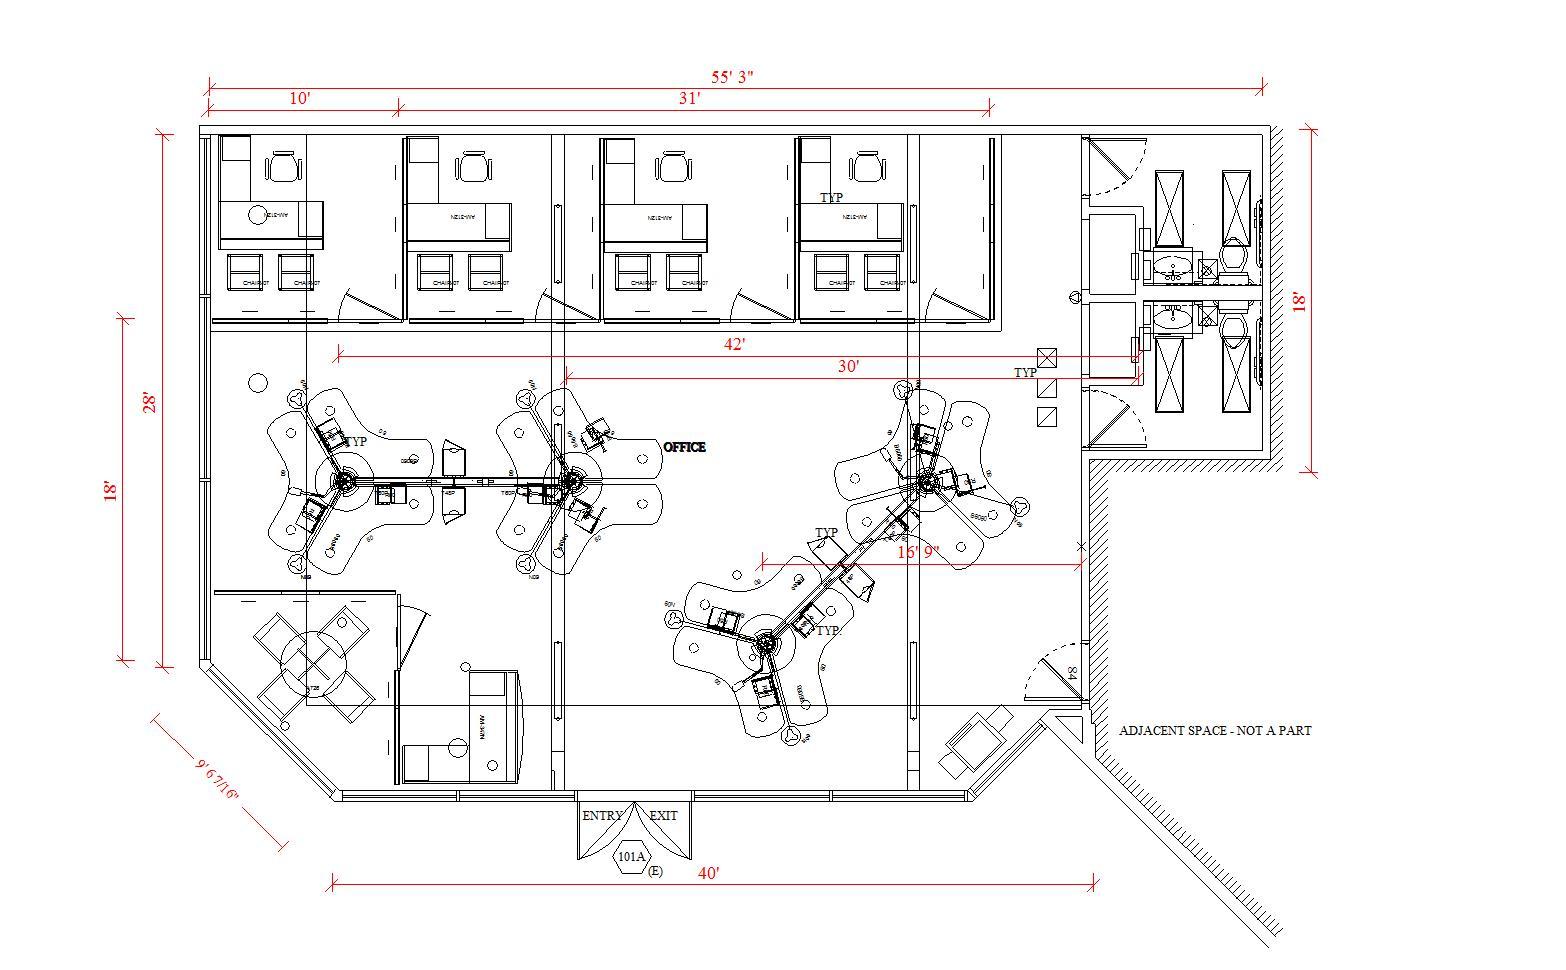 office space planning boomerang plan.  planning furnishing plan on office space planning boomerang